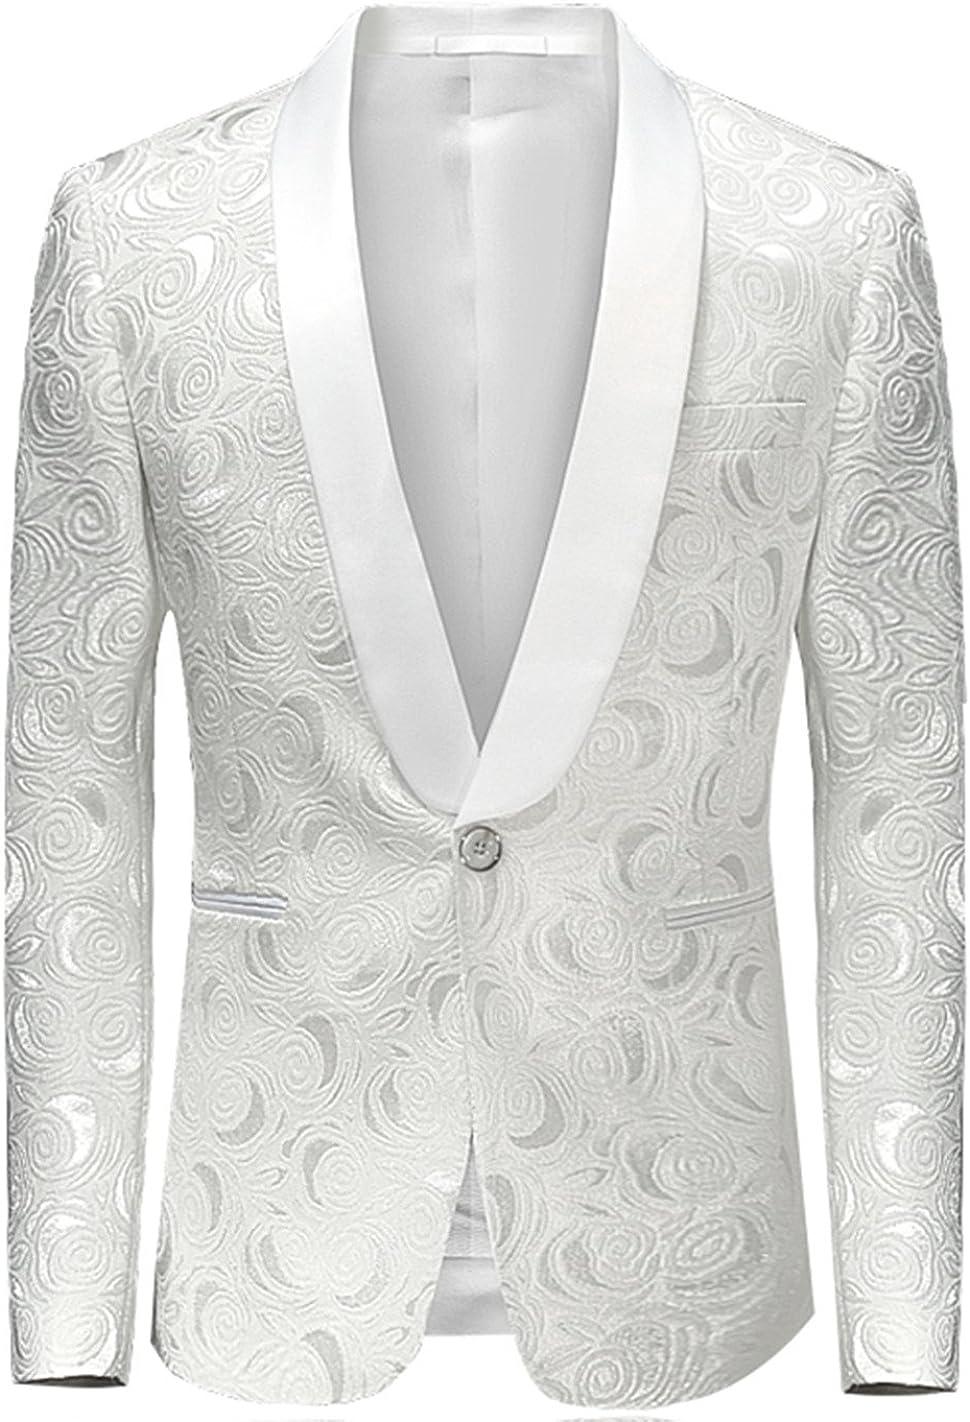 MOGU Mens Blazer Slim Fit Suit Jacket White Floral Jacquard Material